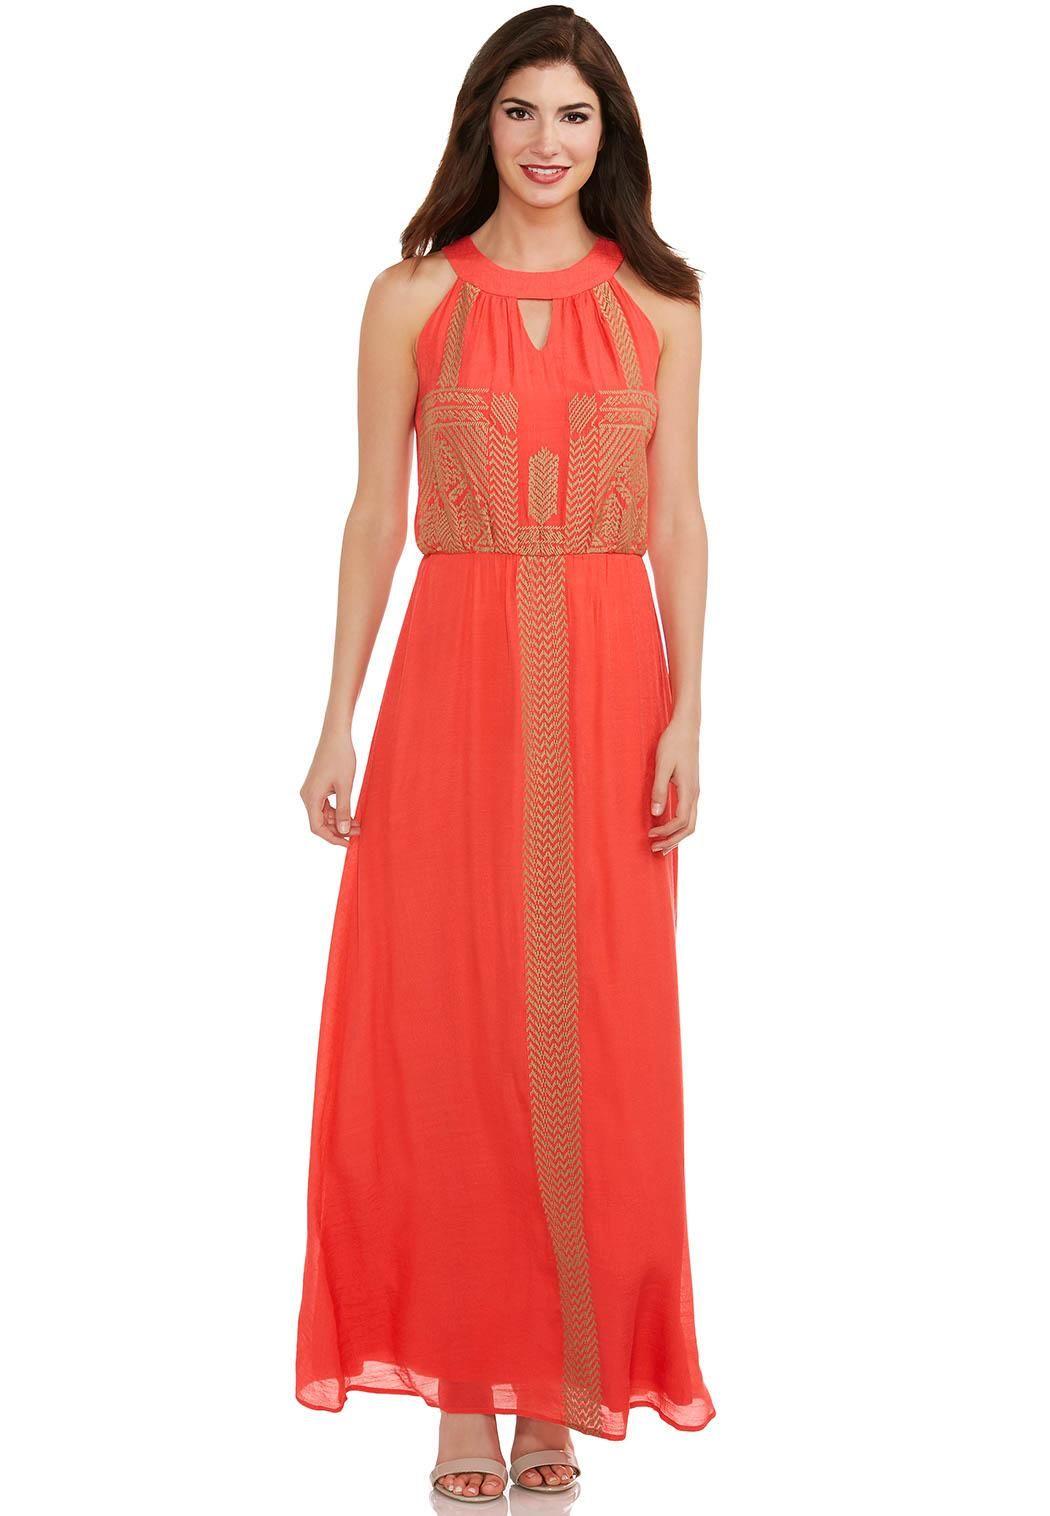 bdb0b7e6a8c Tribal Embroidered Halter Maxi Dress Dresses Cato Fashions